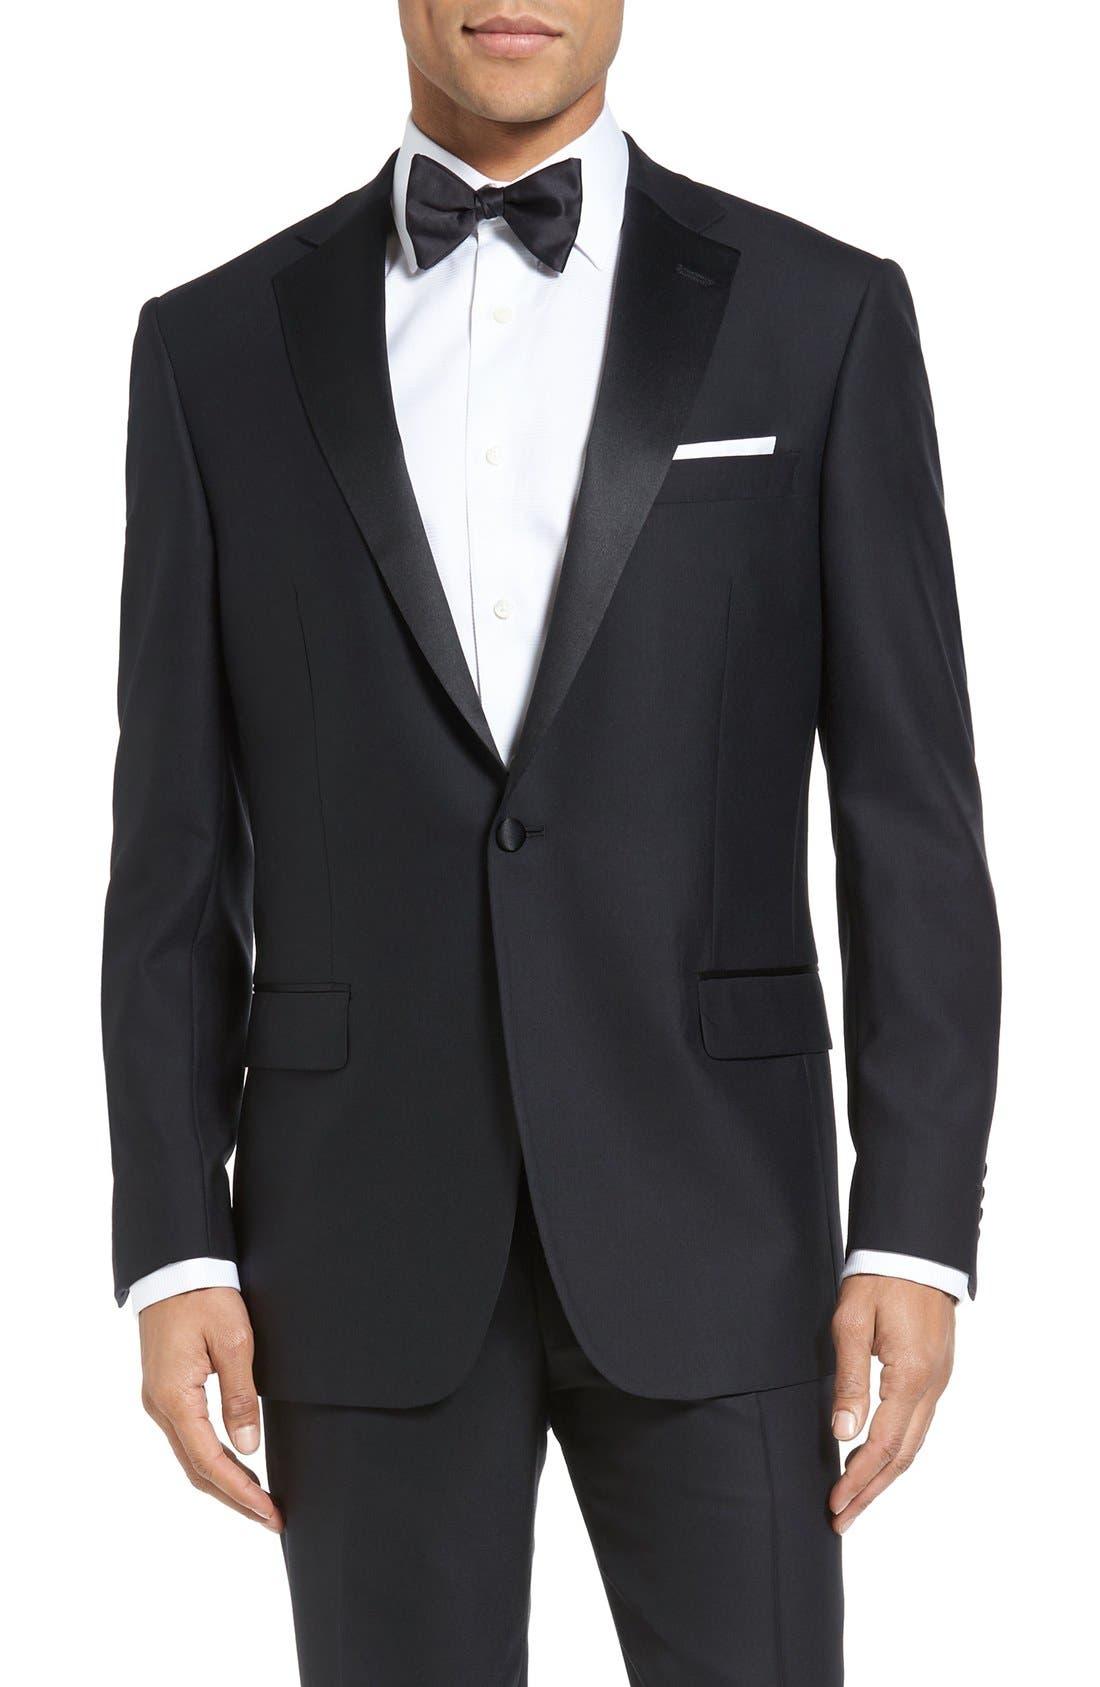 New York Classic Fit Black Wool Tuxedo,                             Alternate thumbnail 5, color,                             BLACK